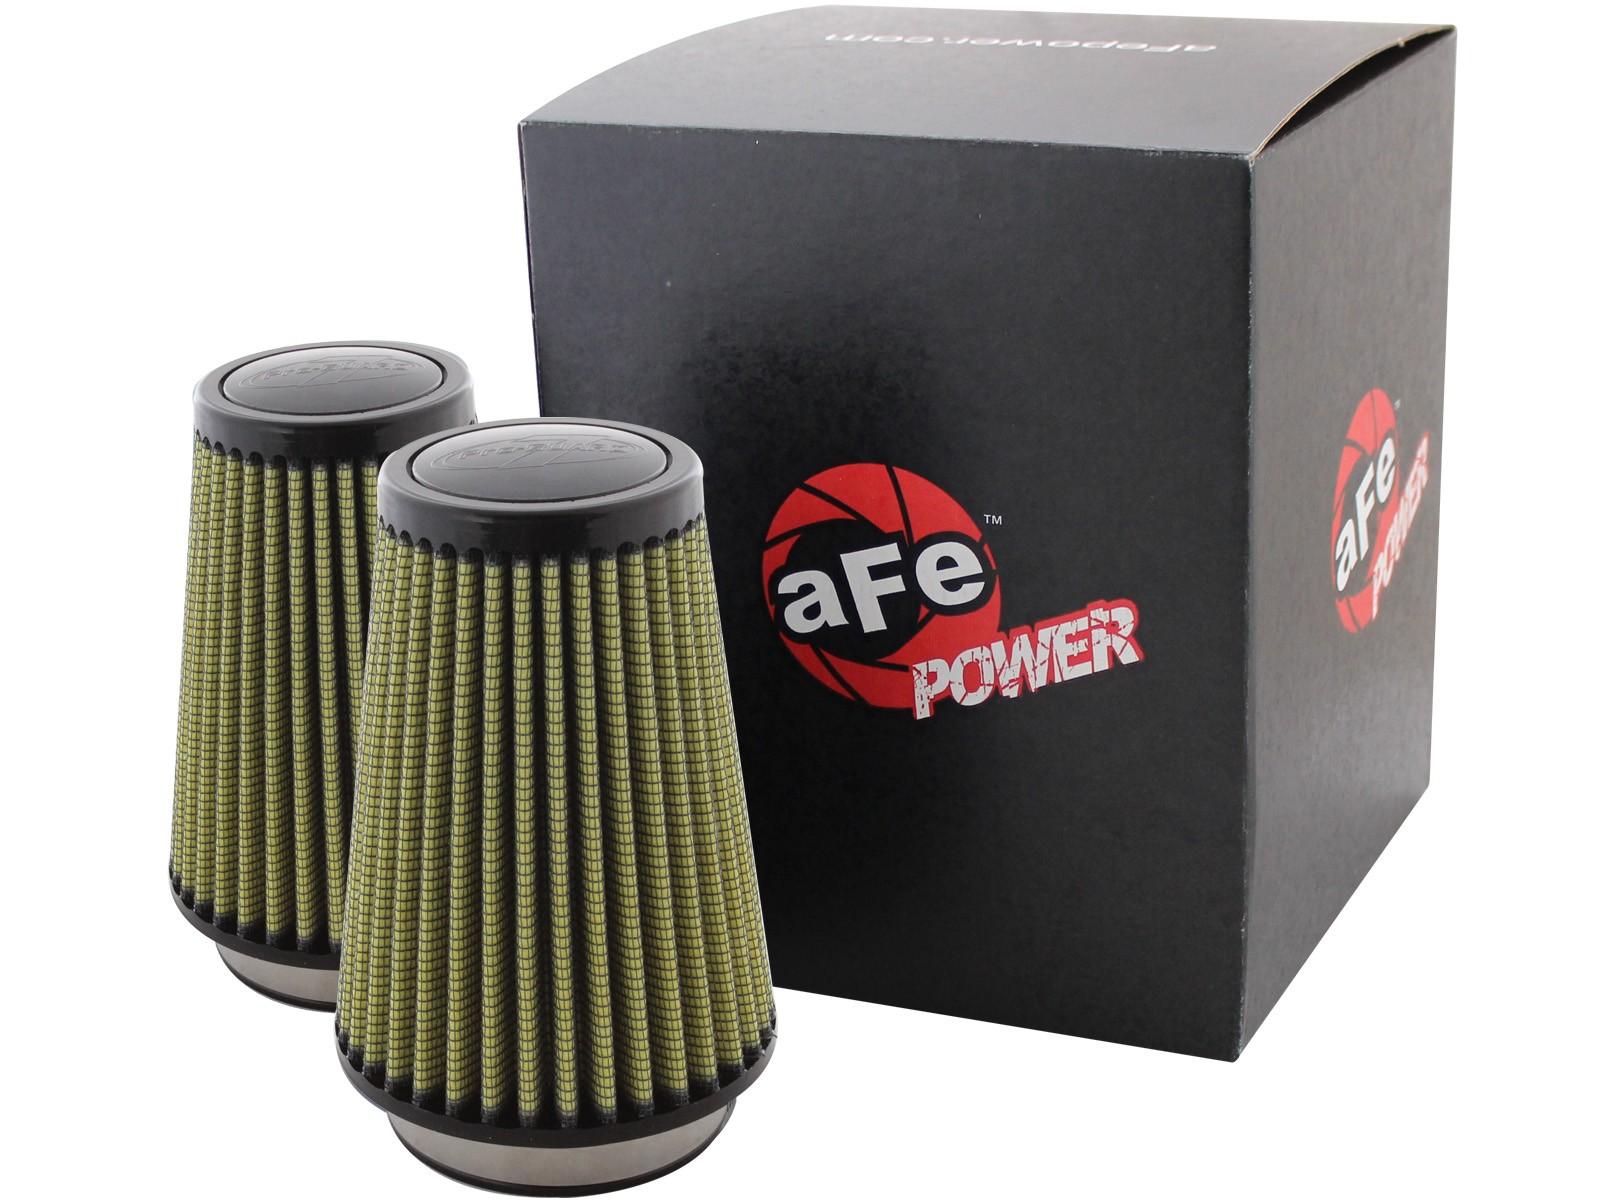 aFe POWER 72-90069M Magnum FLOW Pro GUARD7 Air Filter